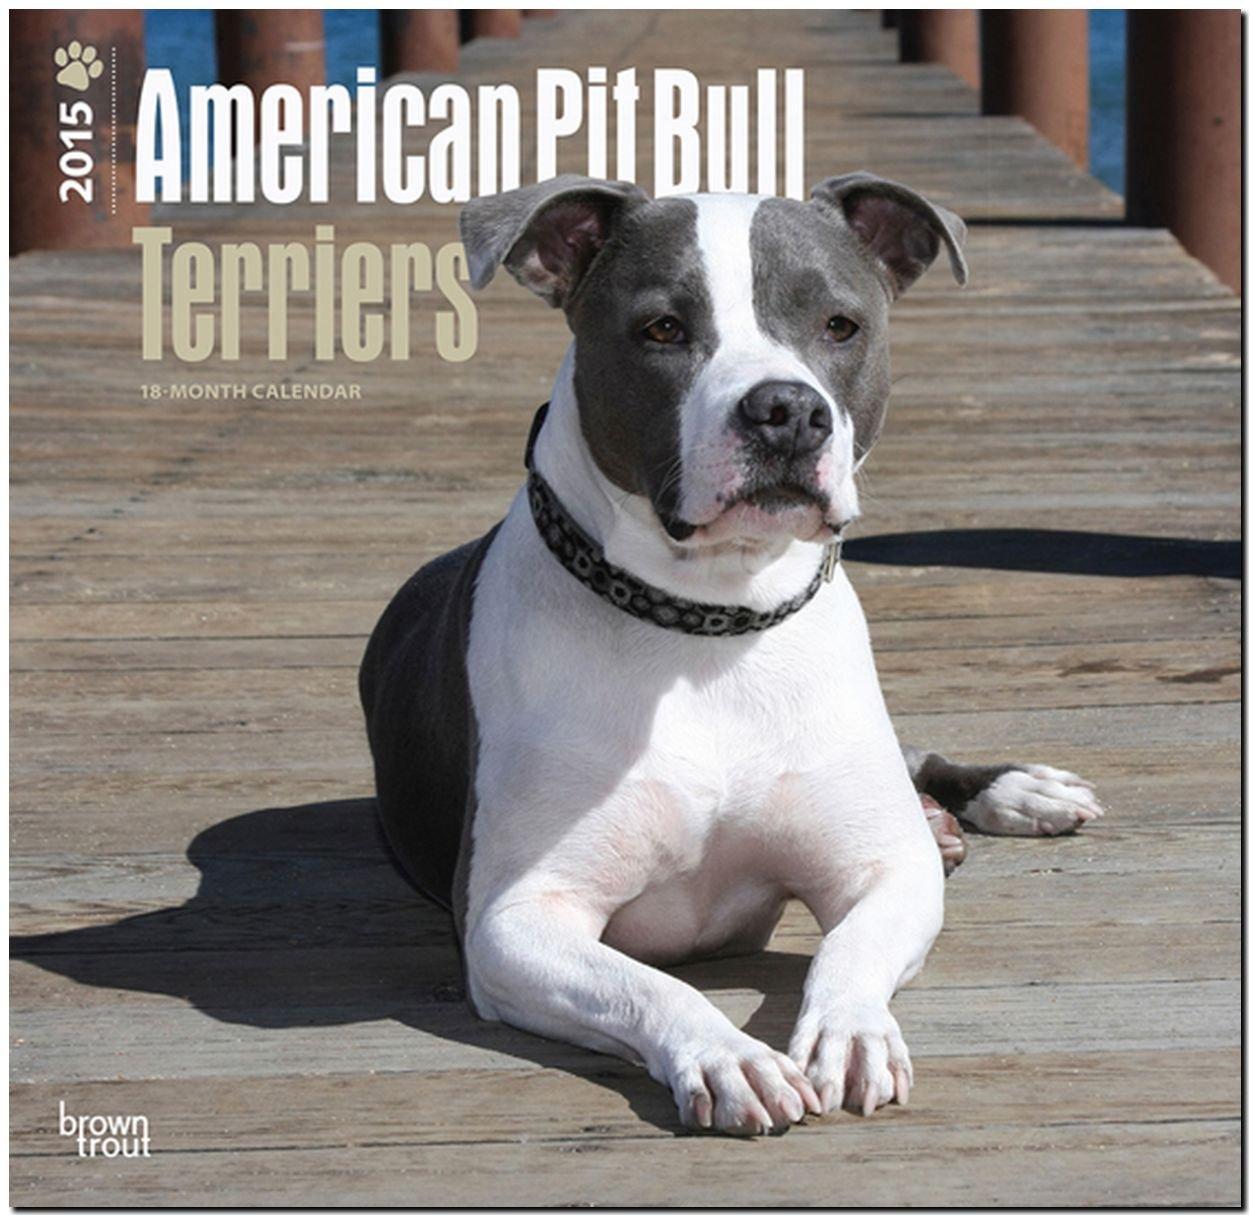 American Pit Bull Terrier Puppies 2015 - Pit Bull Welpen: Original BrownTrout-Kalender [Mehrsprachig] [Kalender]